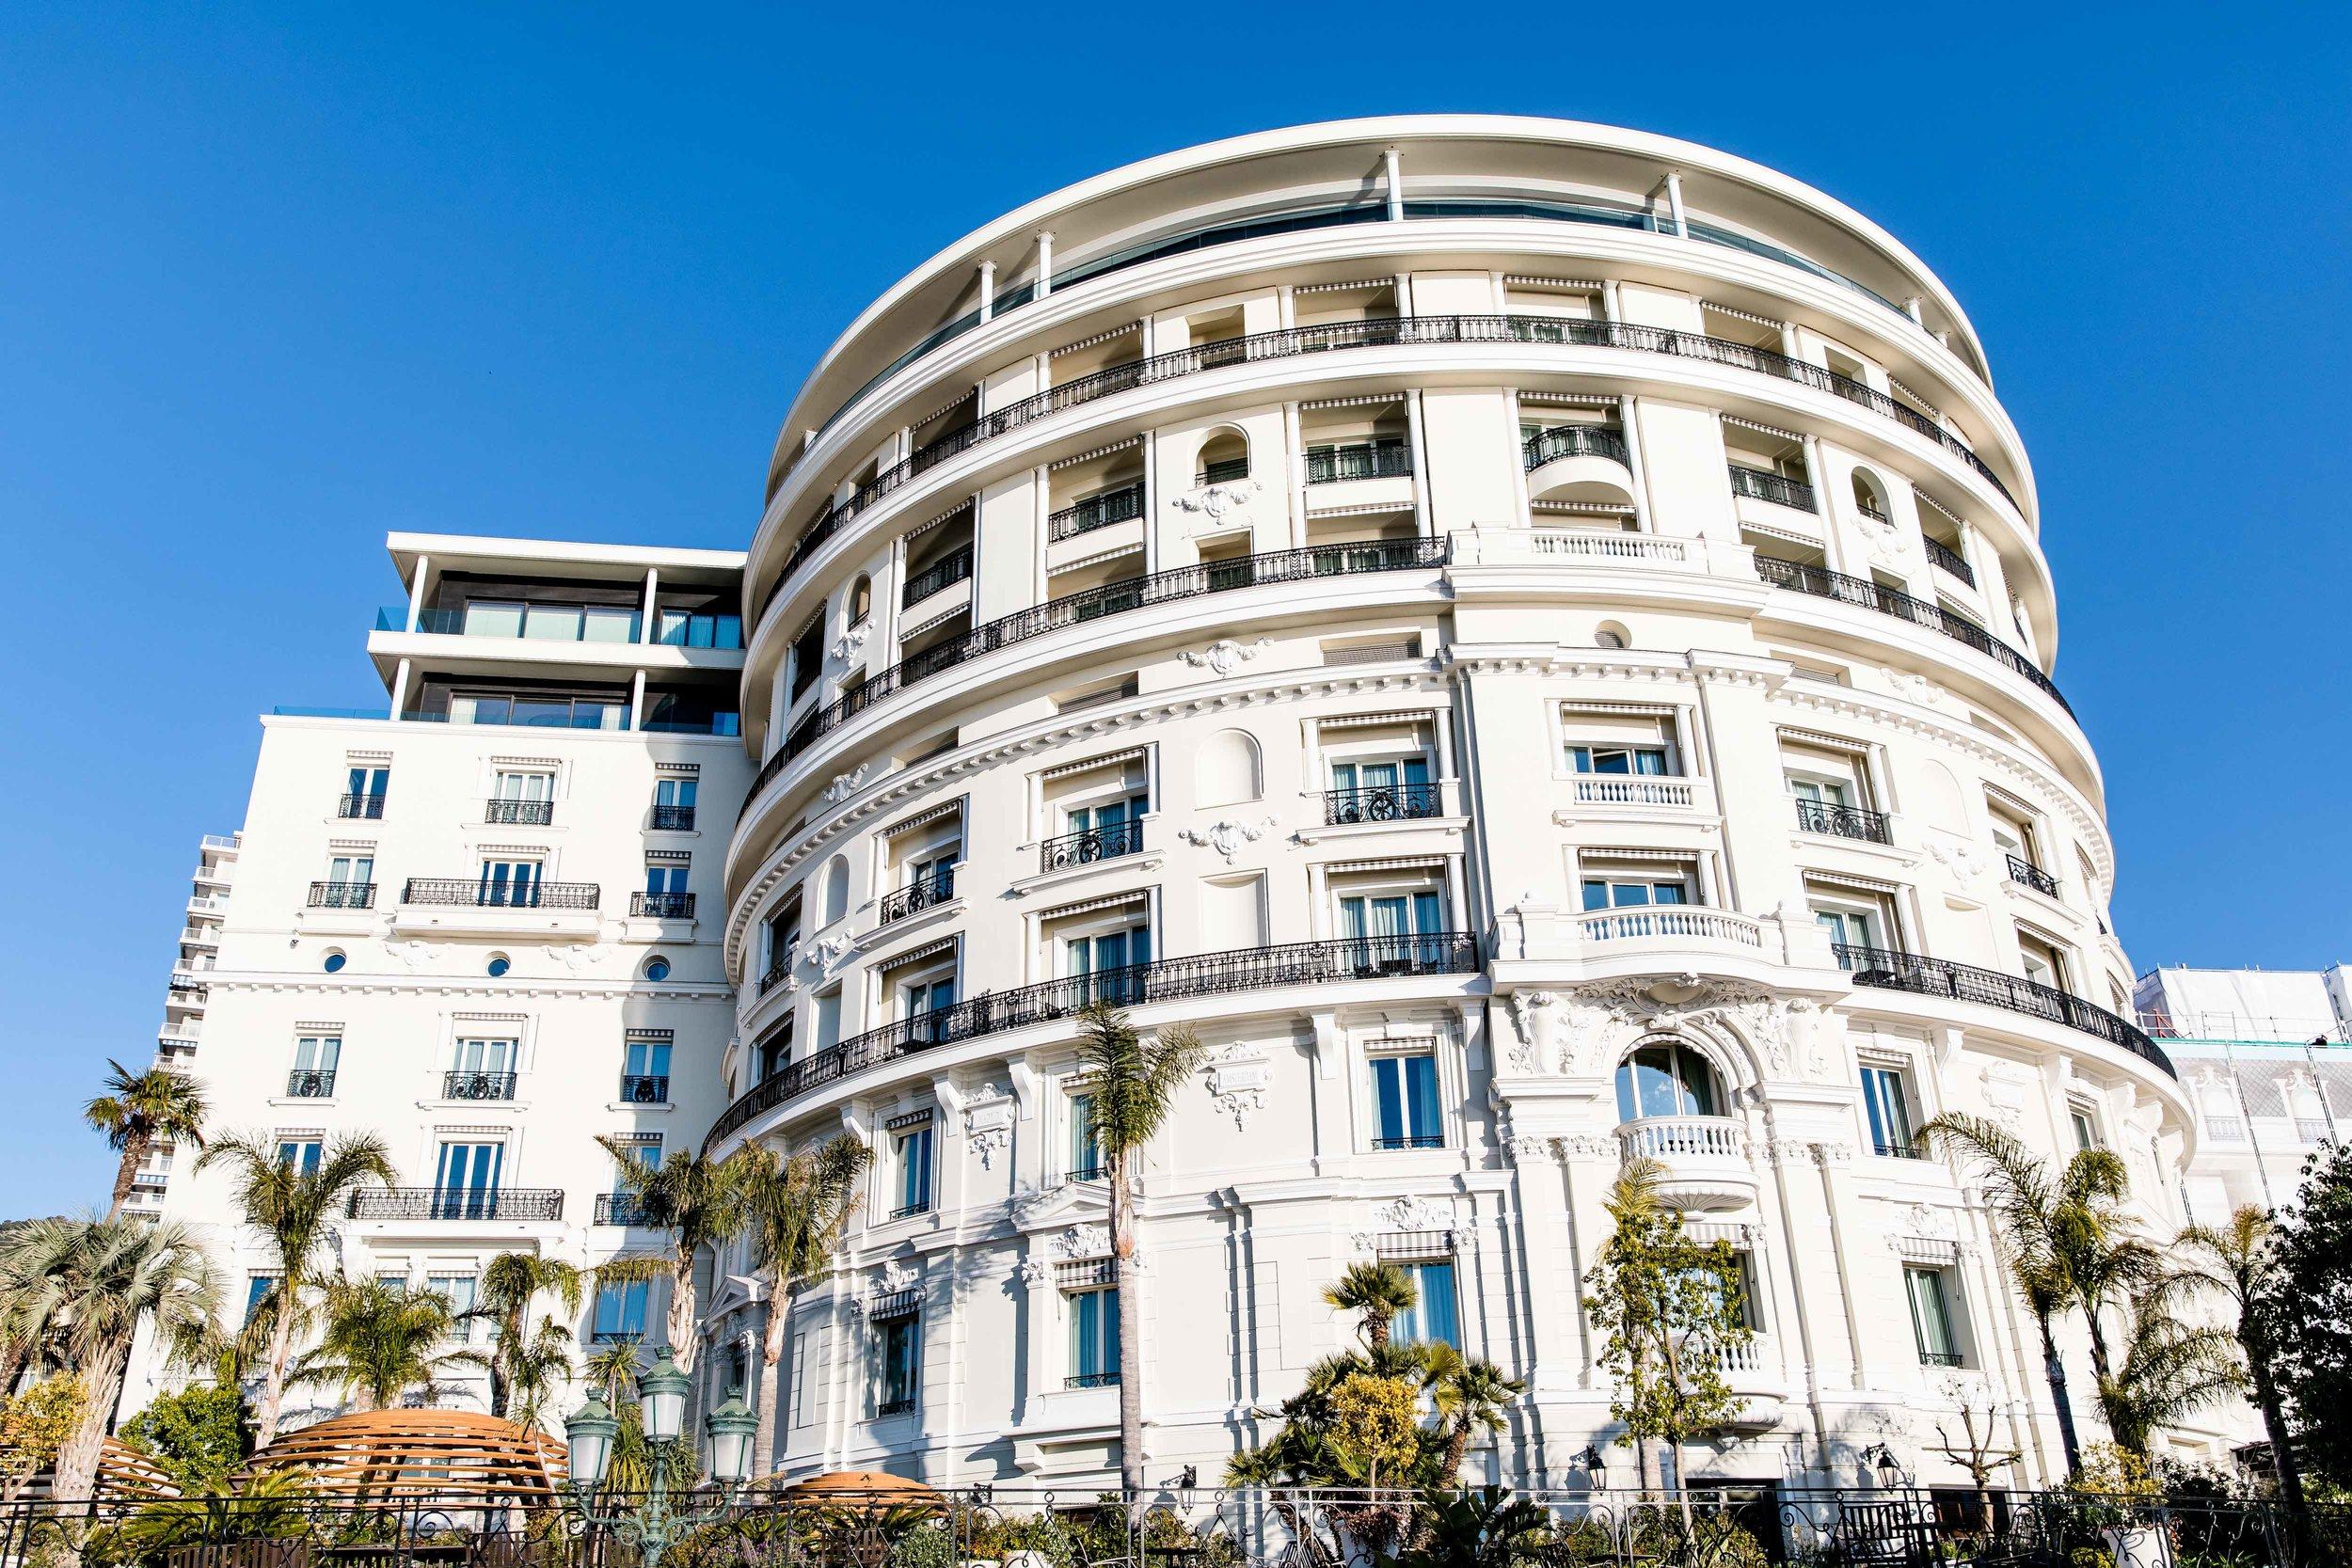 0001 hotel-3.jpg